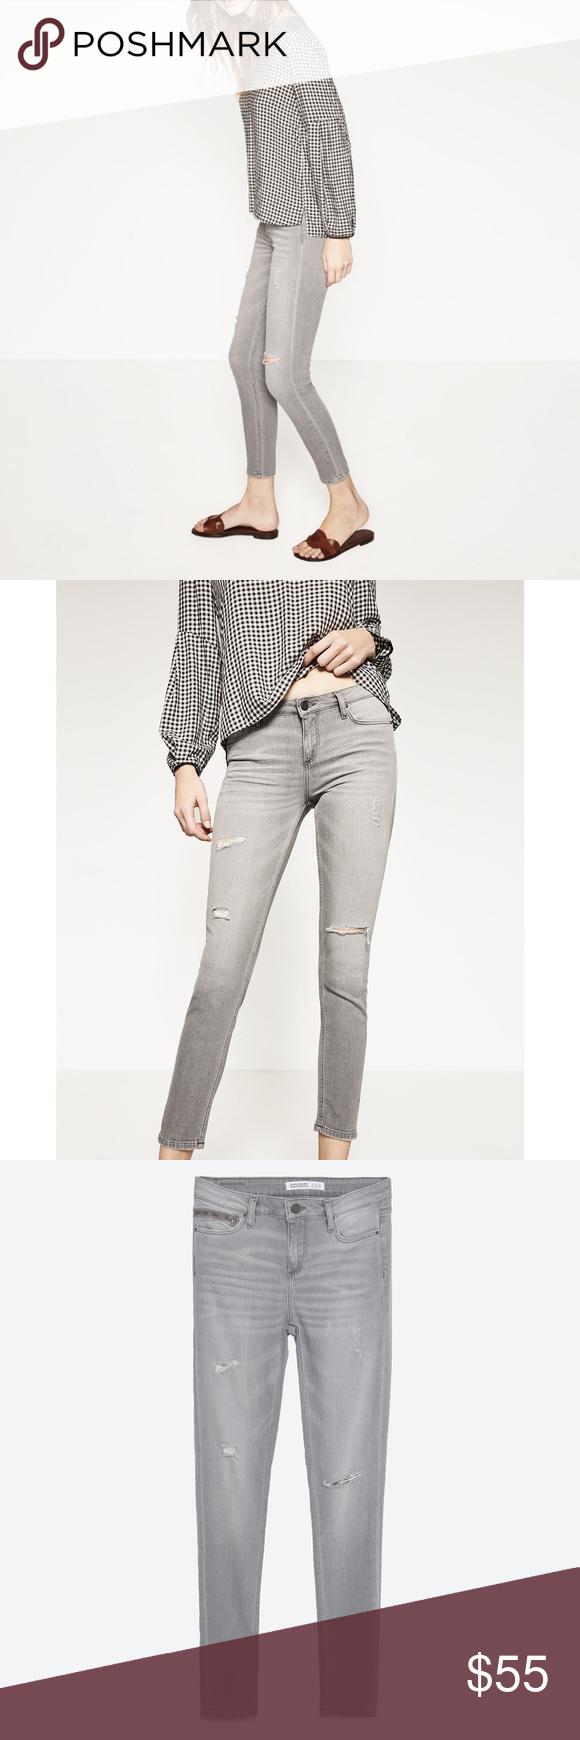 d886933a4a9 NWT ZARA Gray Distressed Holes Skinny Jeans ♡ ZARA Basic Department Denim  Z1975 Light Wash Gray